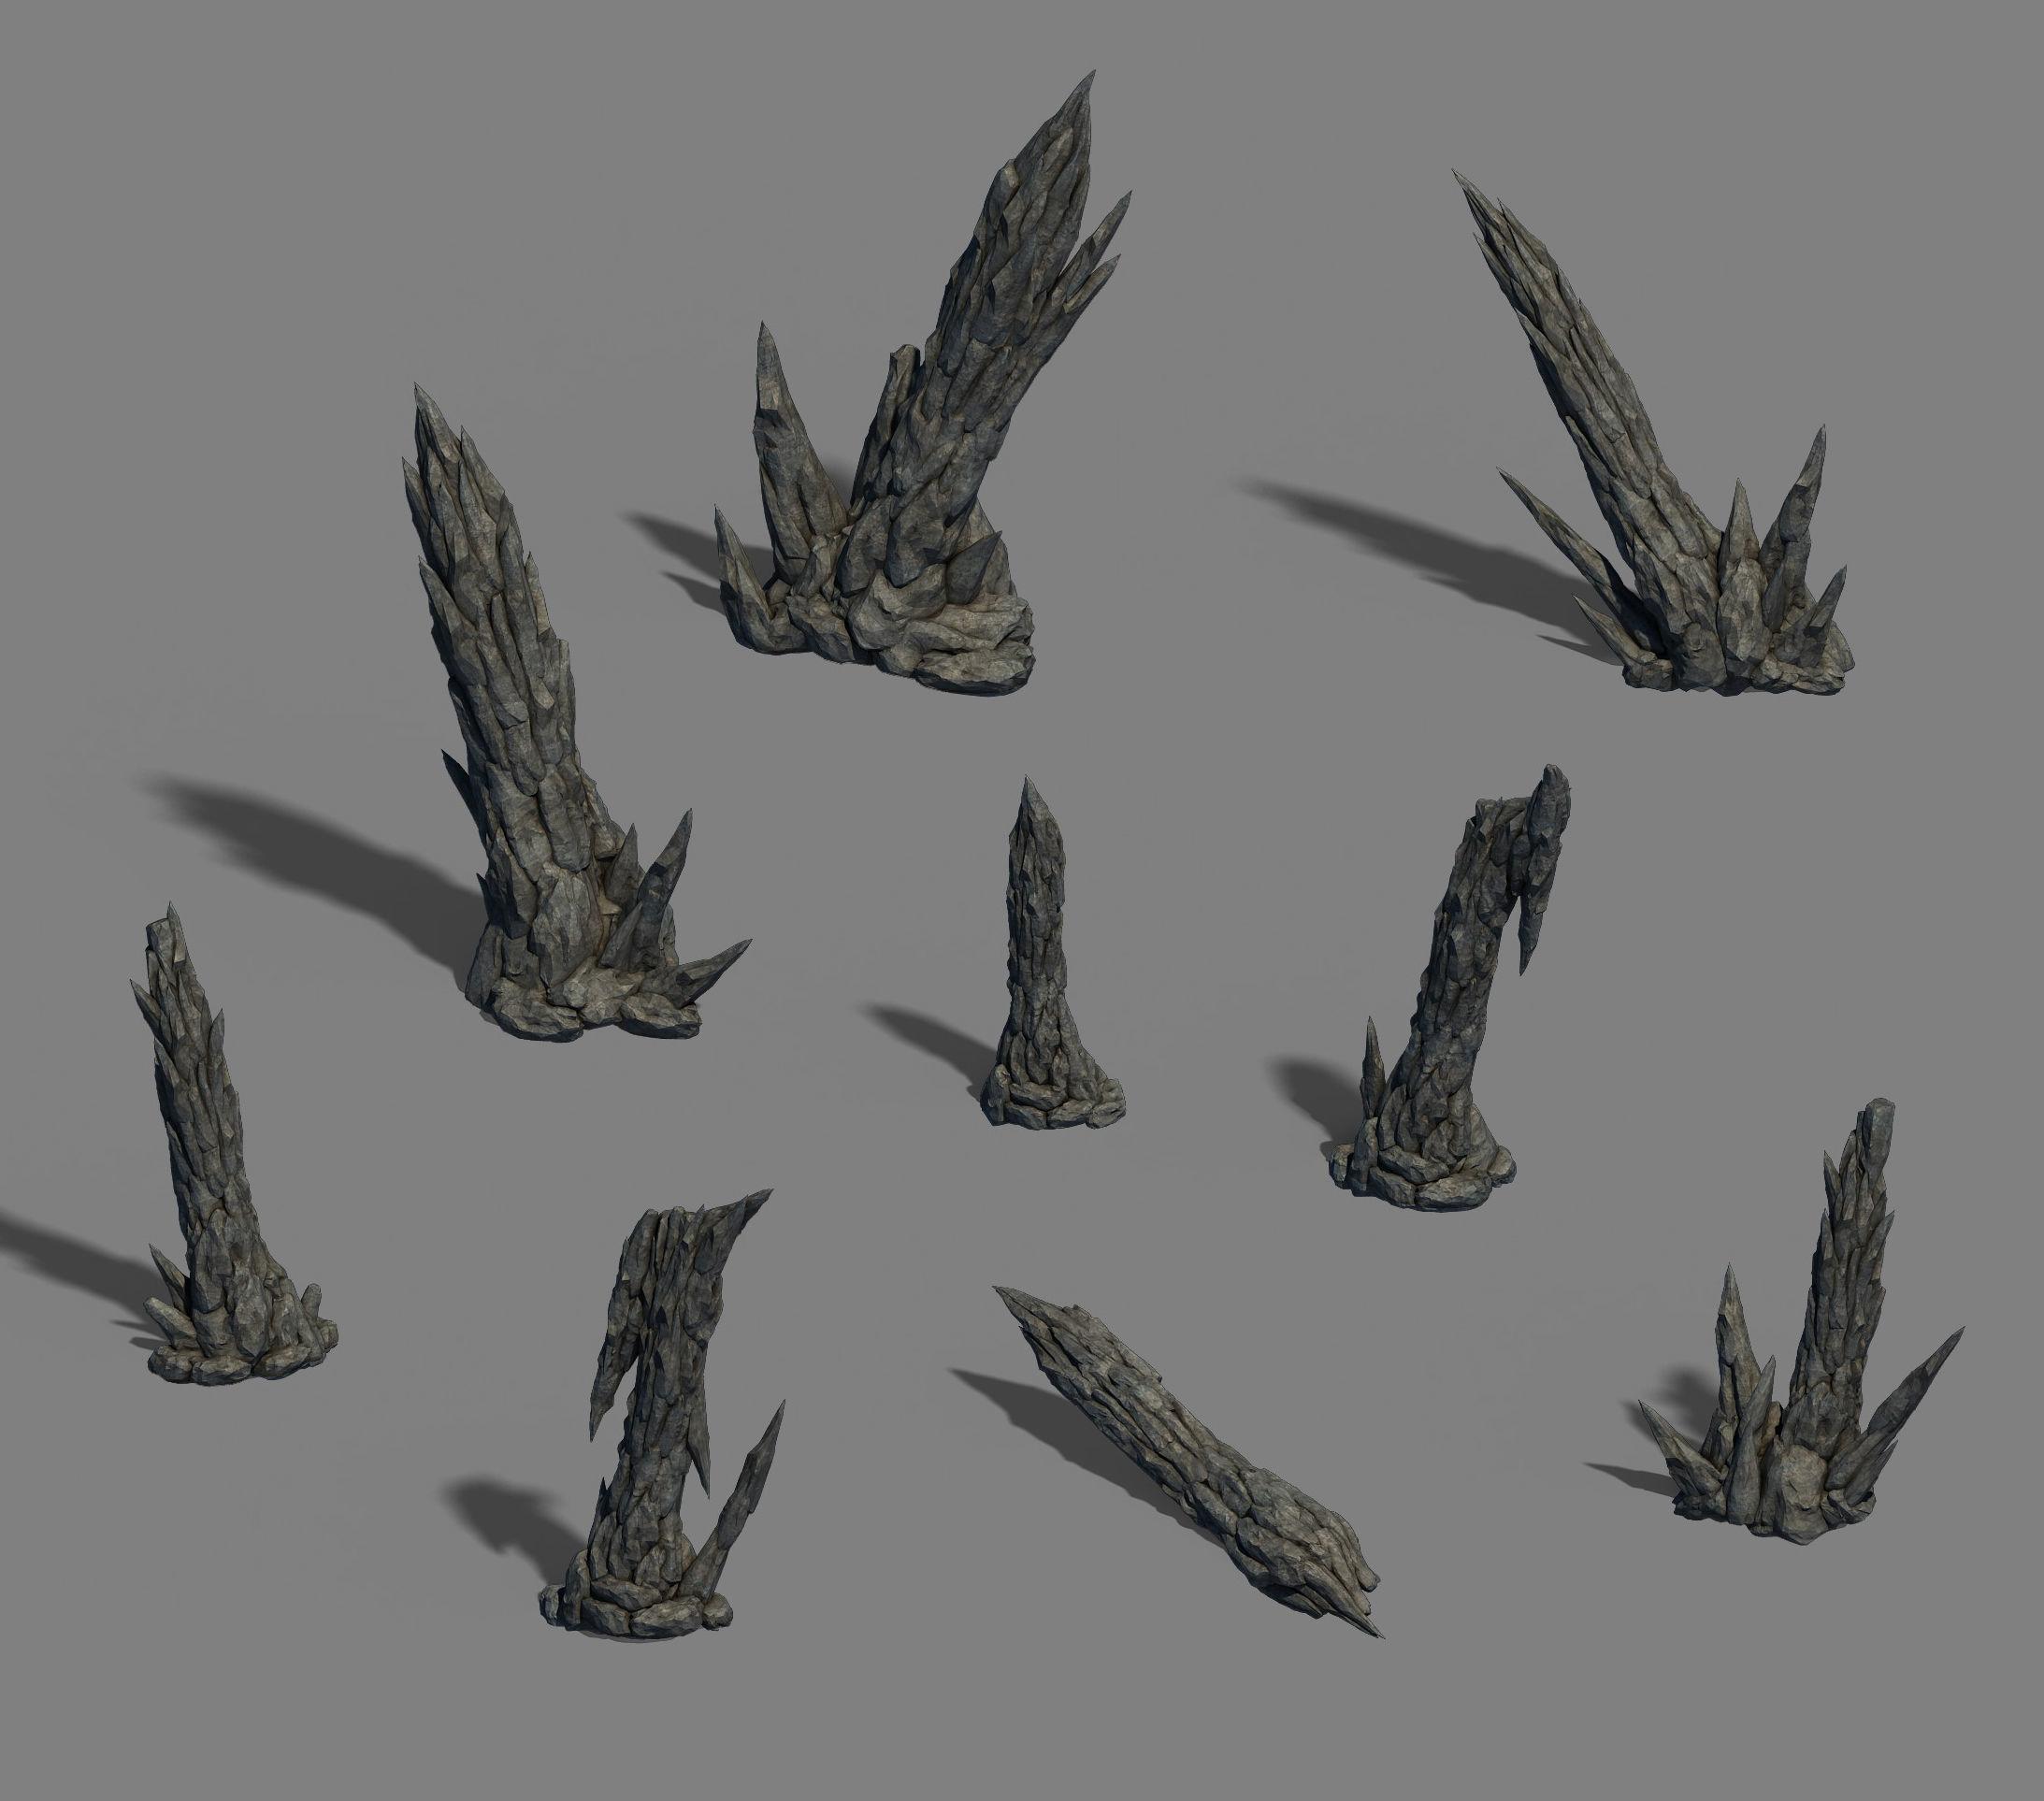 Zhaoshan - stone stone teeth